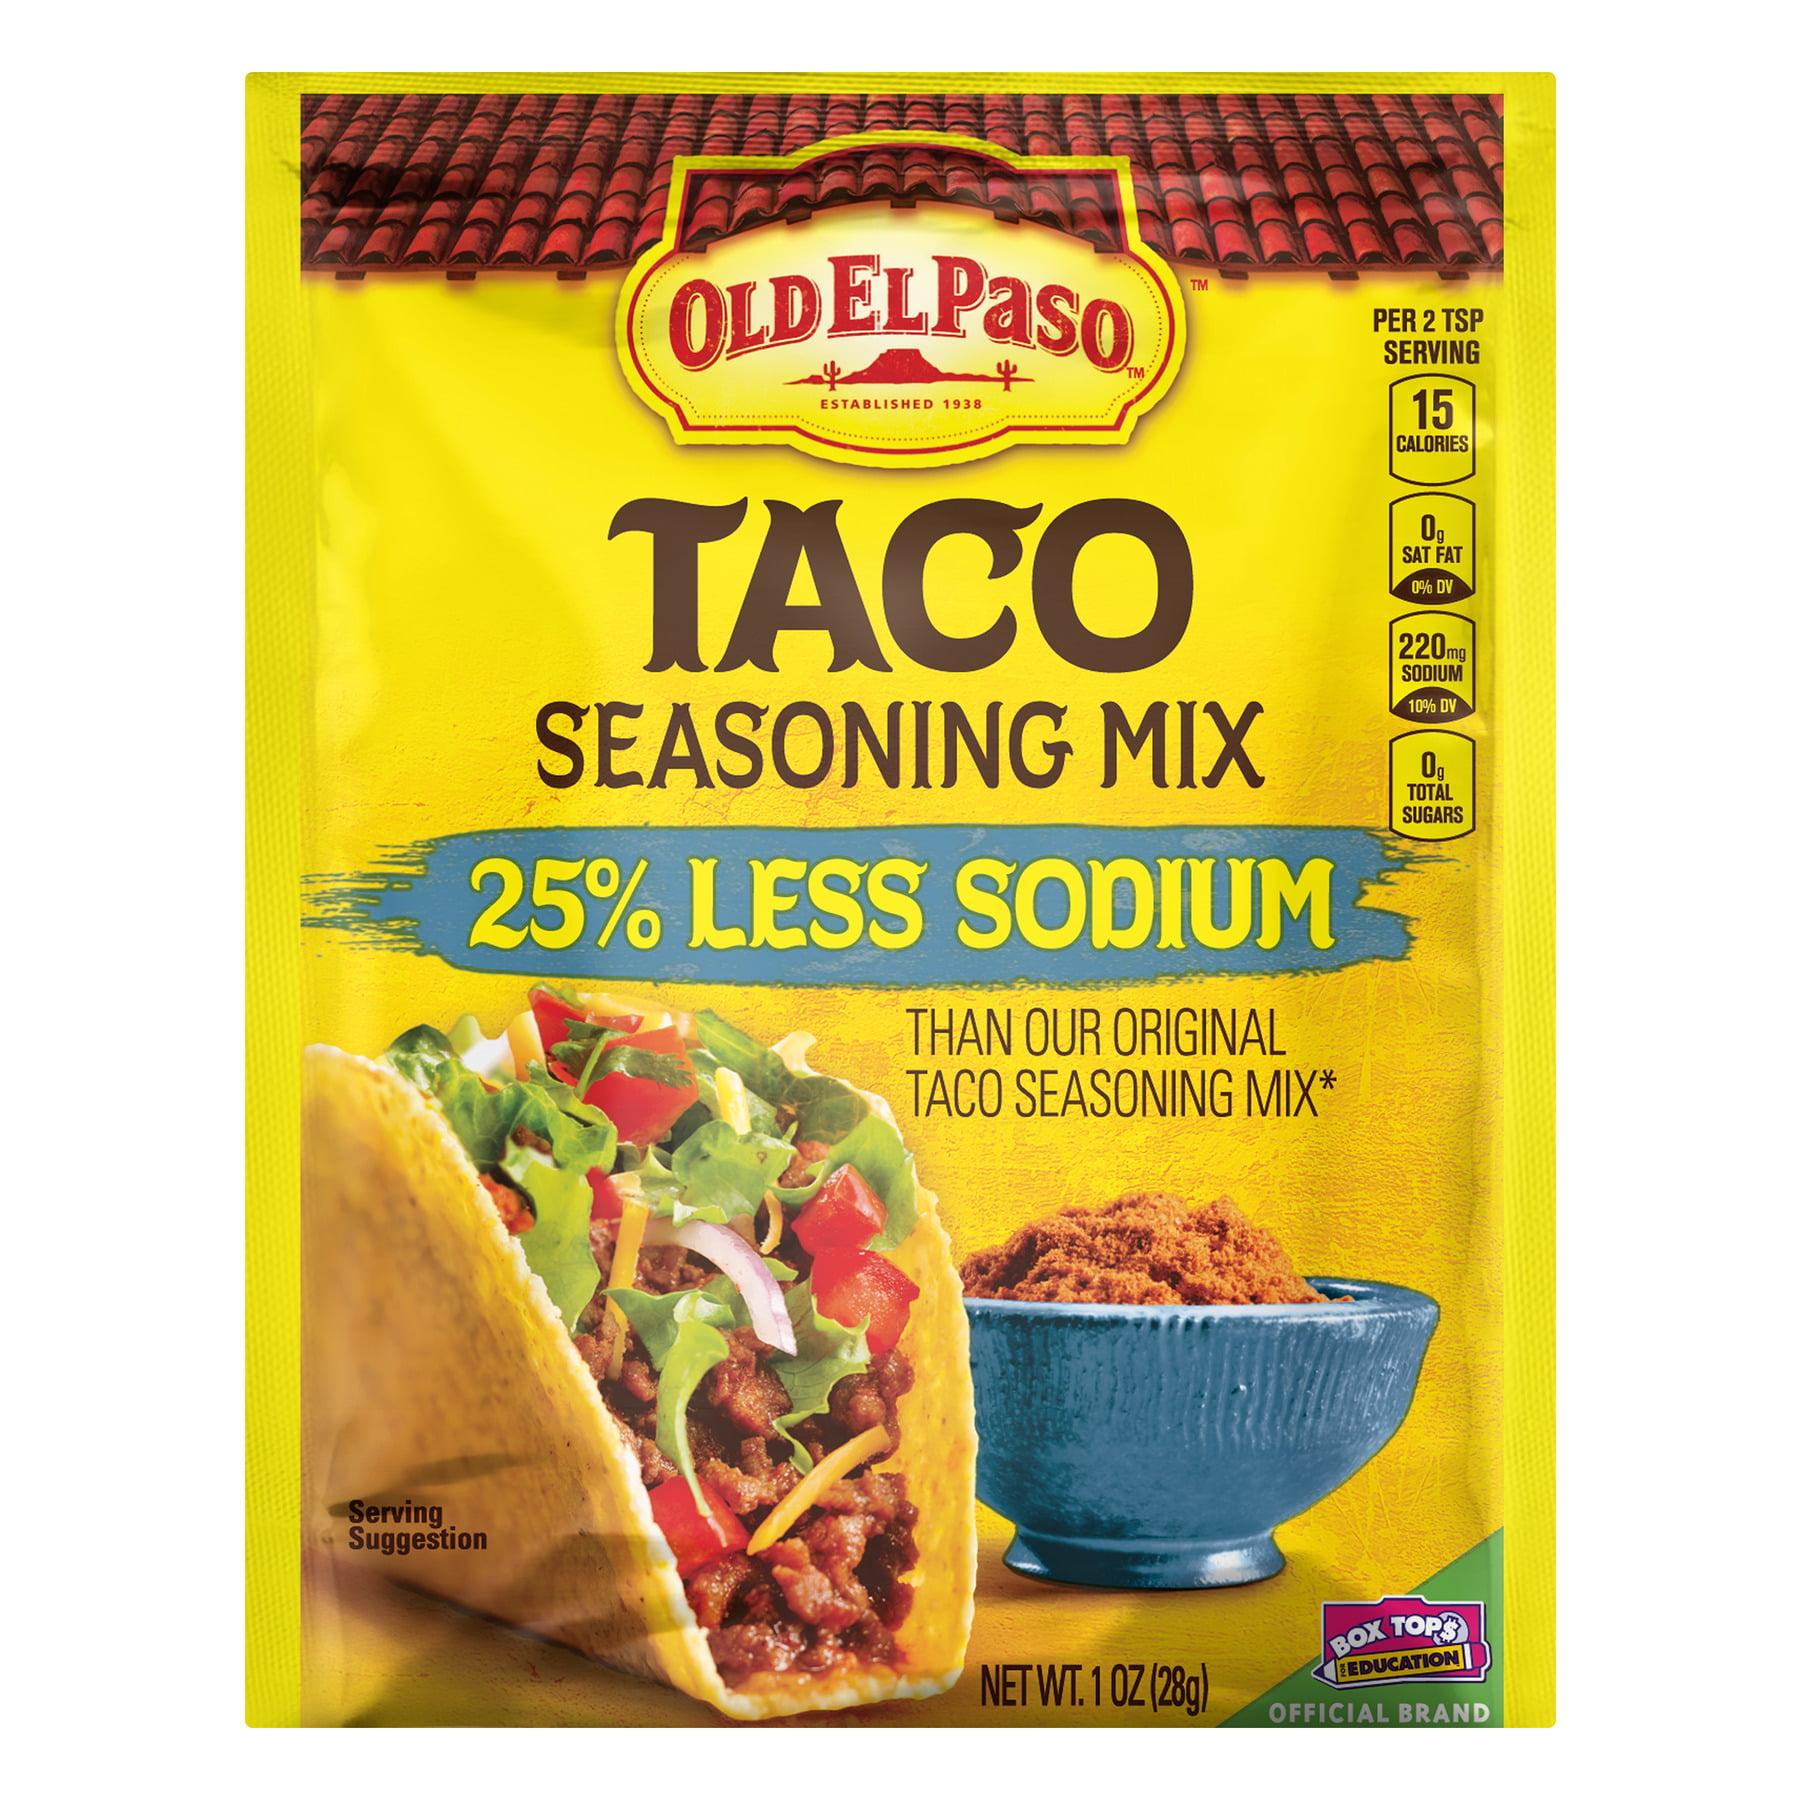 (4 Pack) Old El Paso Taco 25% Less Sodium Seasoning Mix, 1 oz